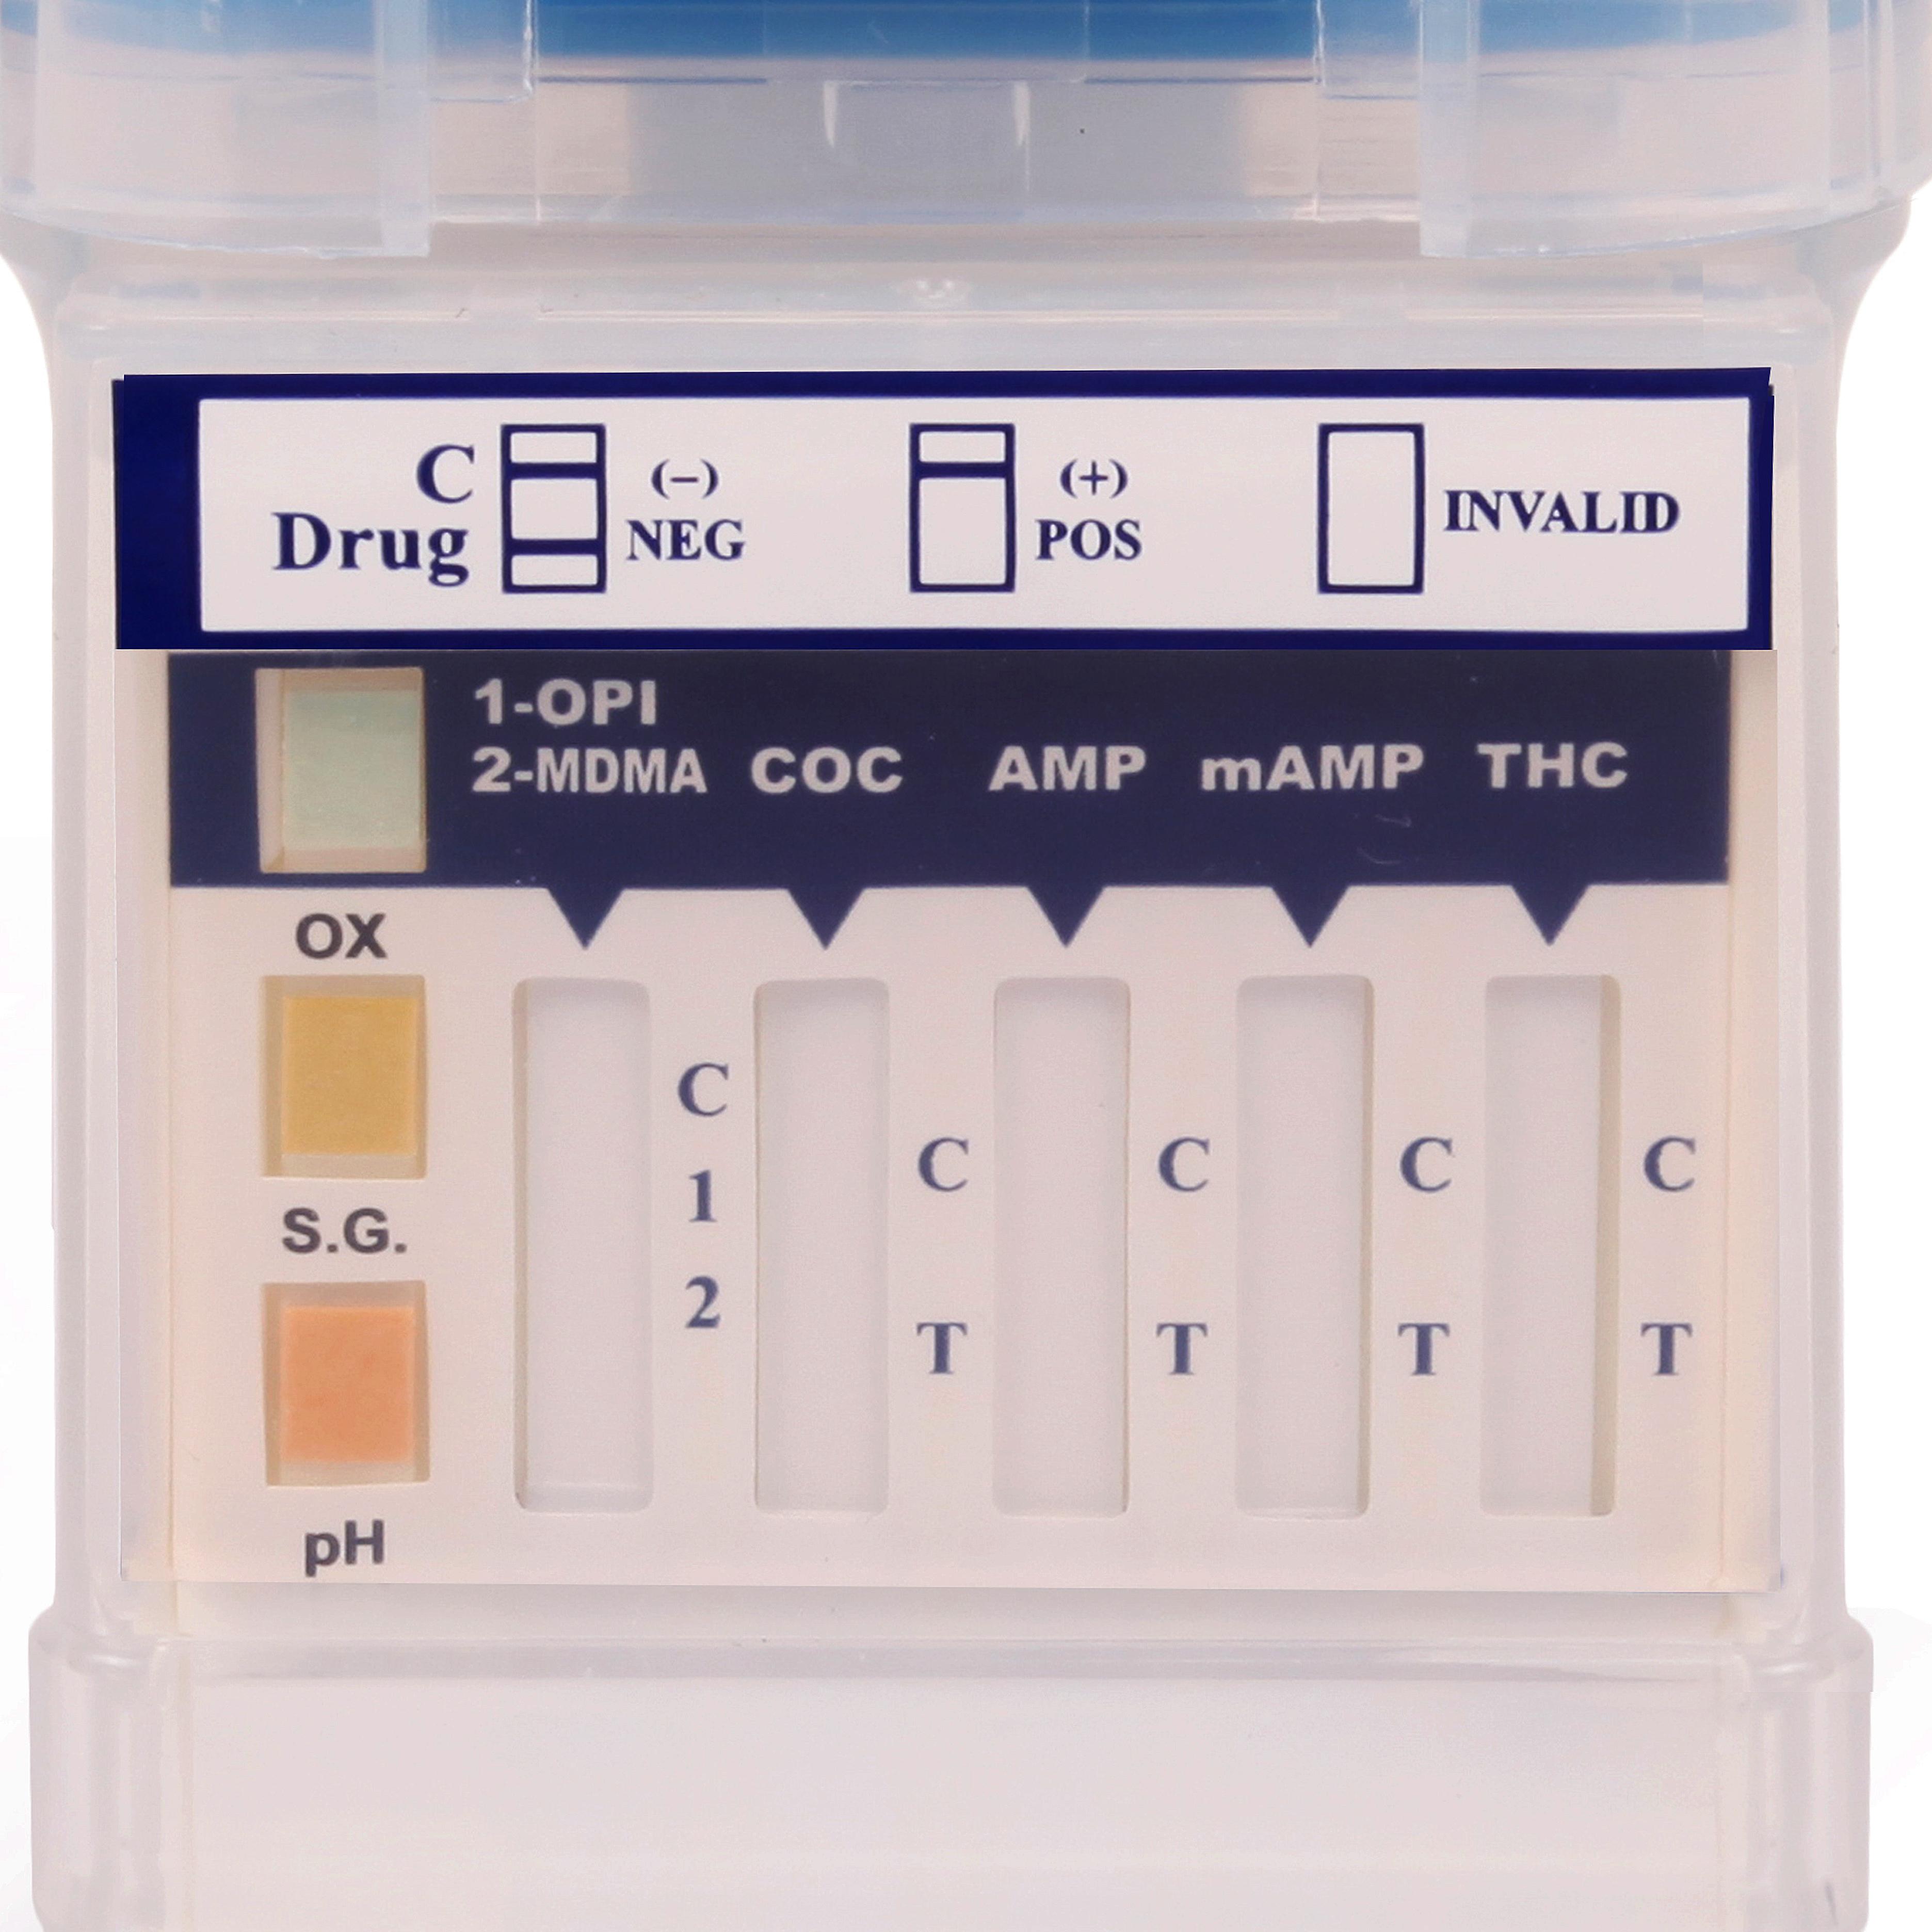 ACCUTEST, SplitCup, Multi, Drug, 25 Box, CLIA Waived, Multi, Drug, Test, 25, Box, drugtestkitusa, h5, MTD, OXY, PCP, BAR, BUP, BZO, MET, THC, TCA, COC, OPI, AMP, MDMA